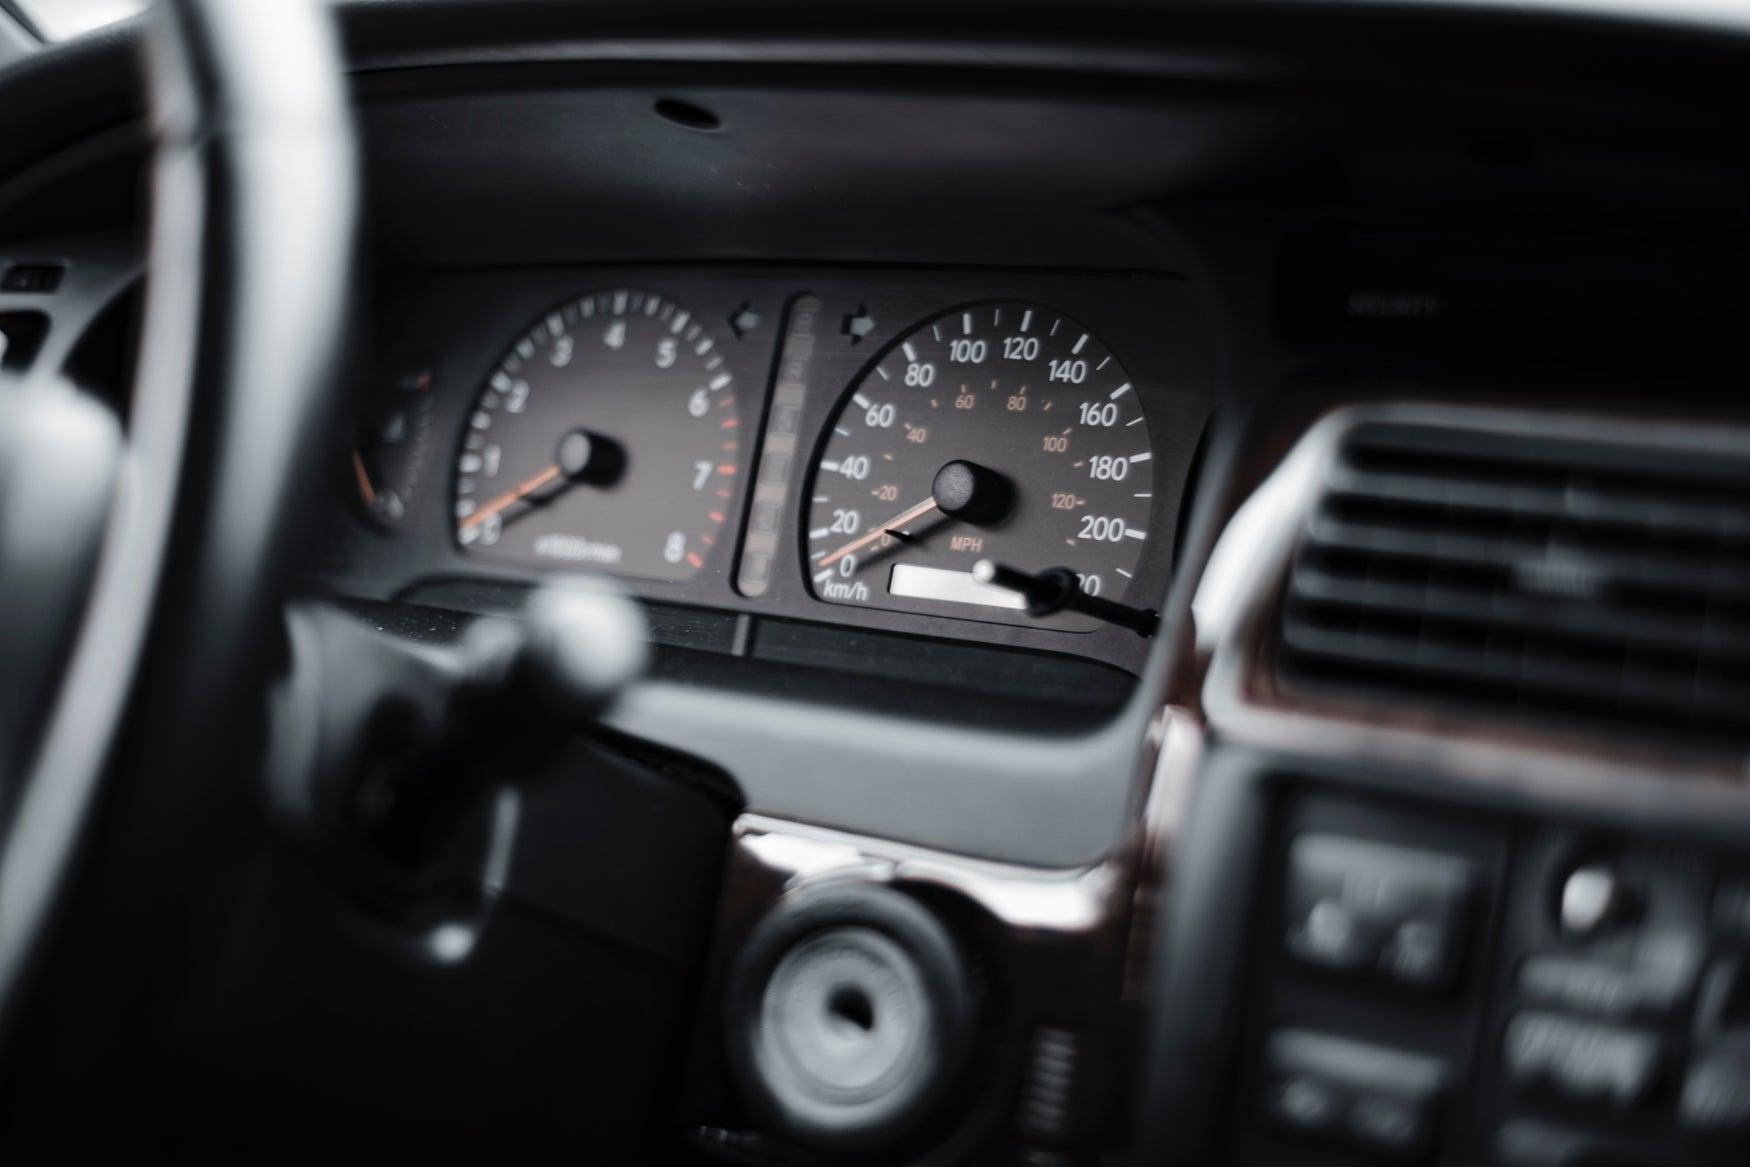 Dashboard mileage